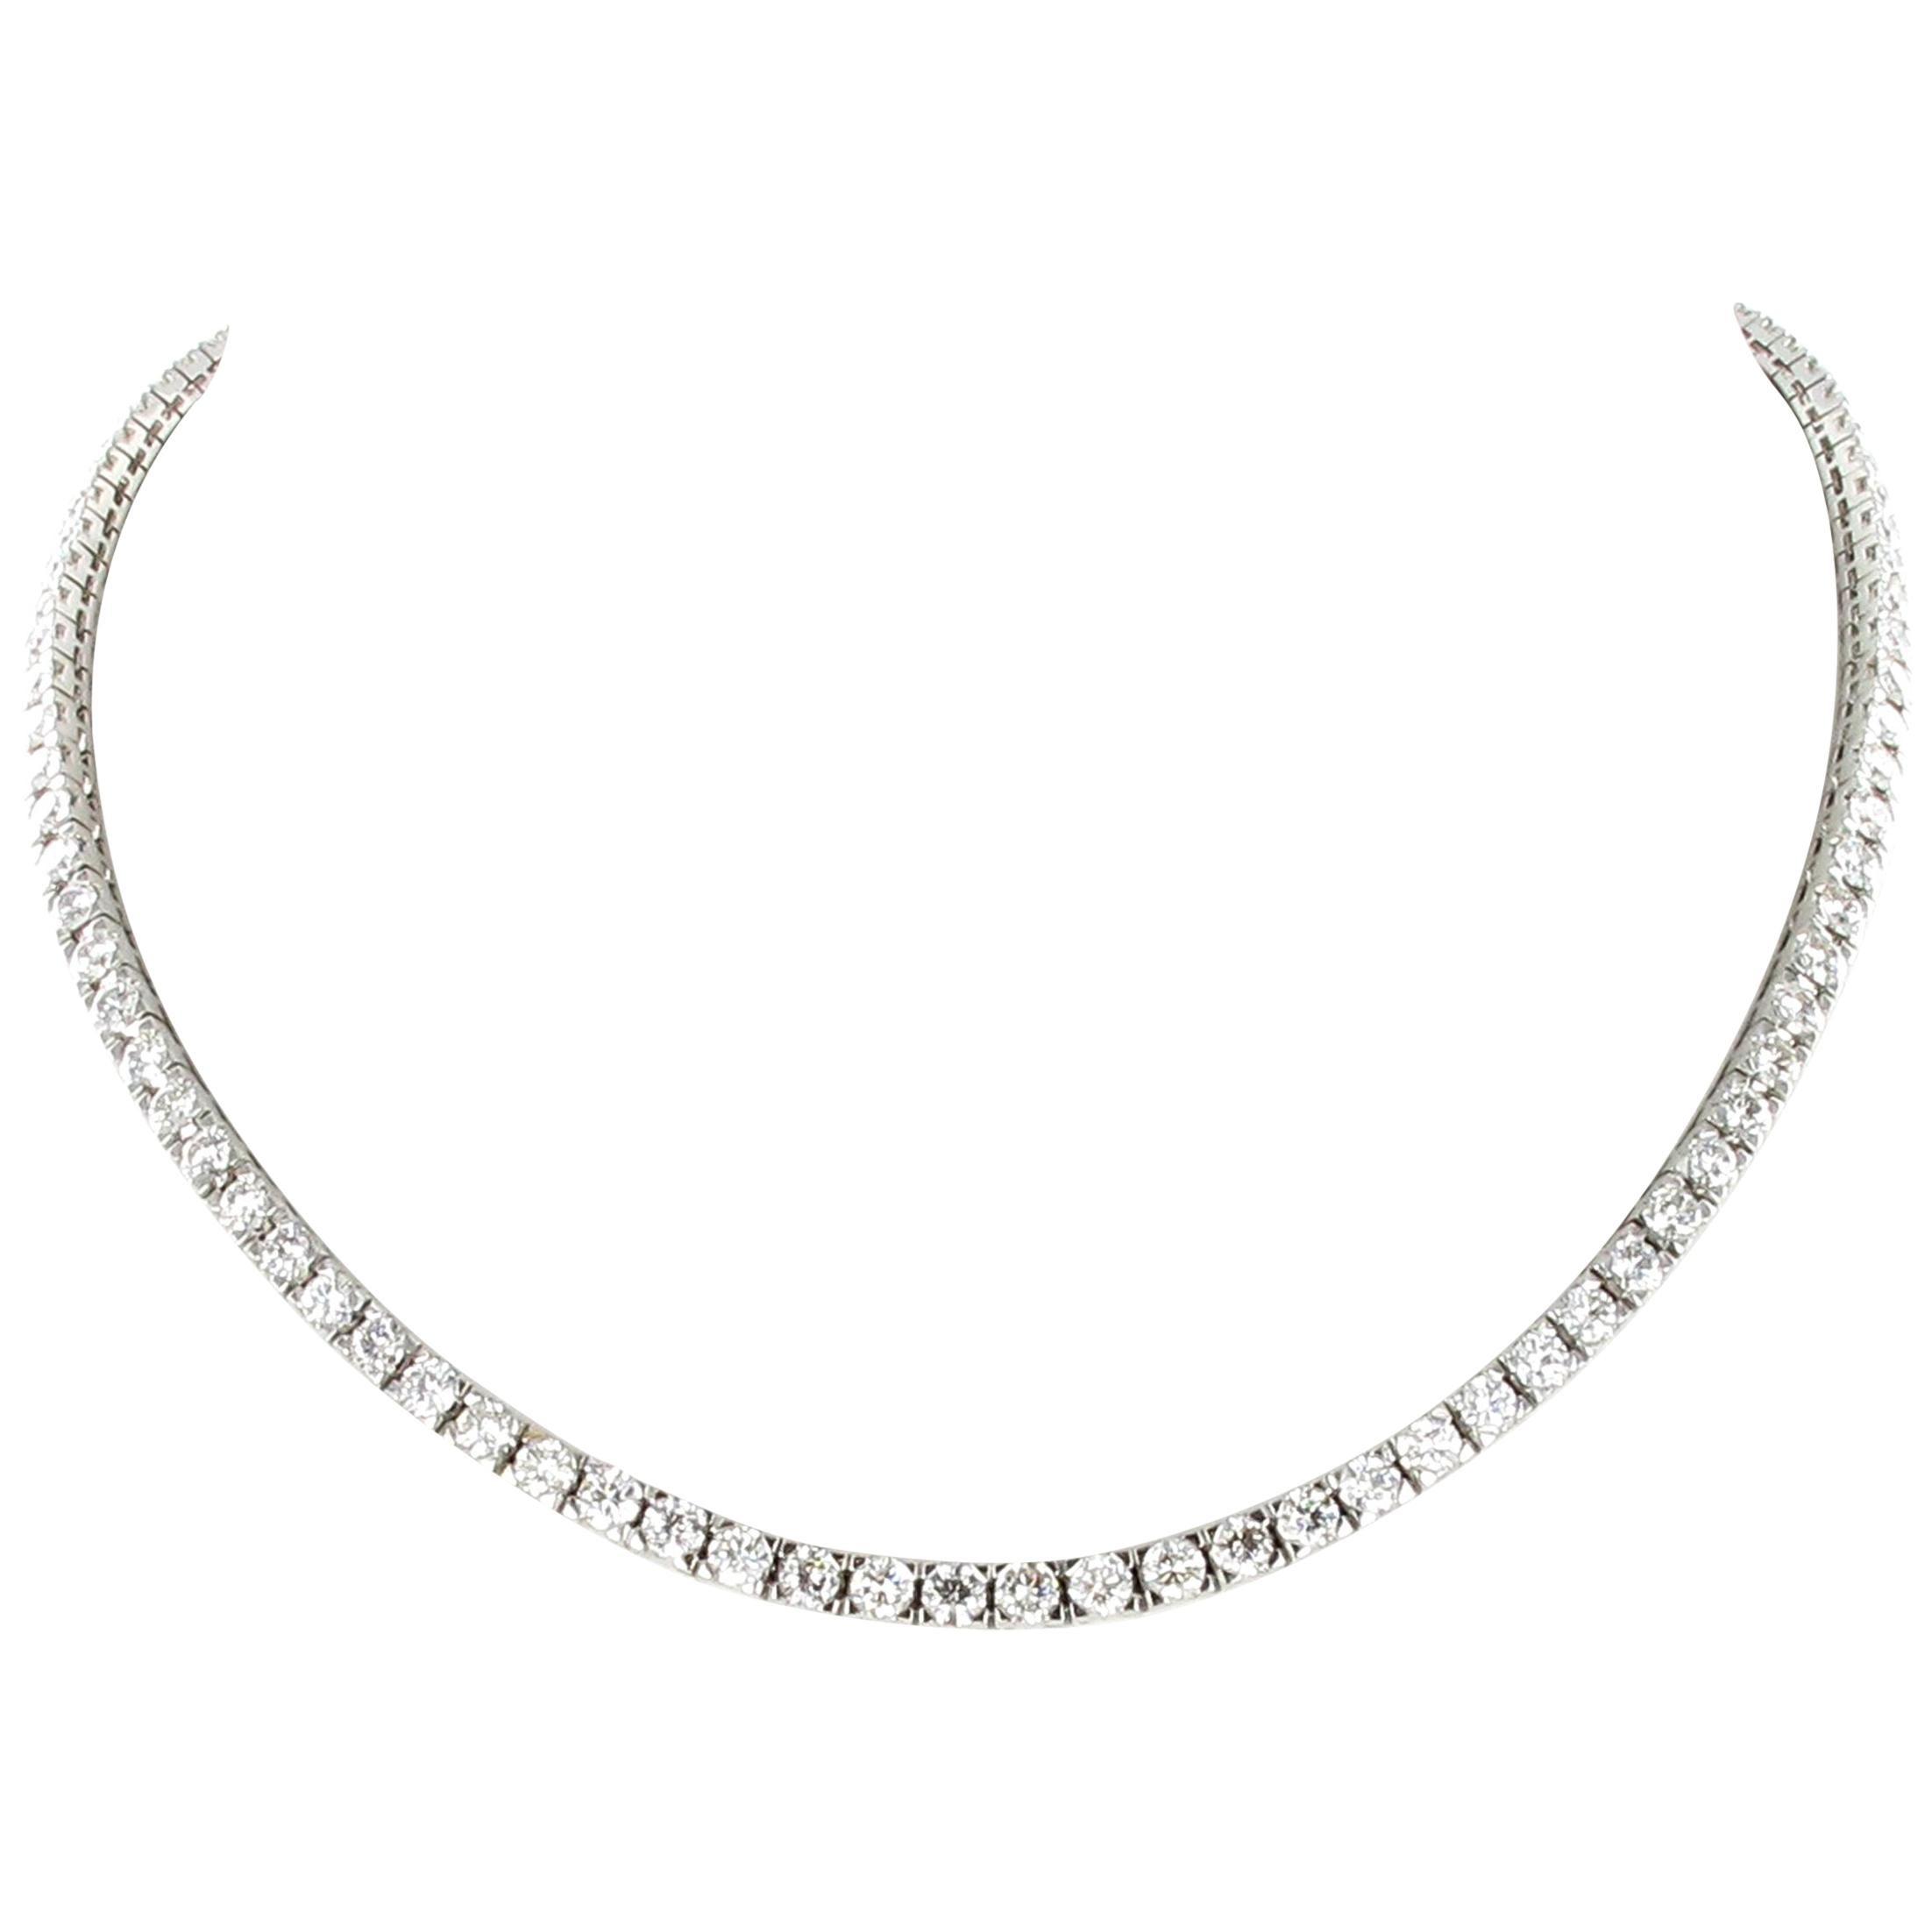 Rivière Diamond Necklace in 18 Karat White Gold